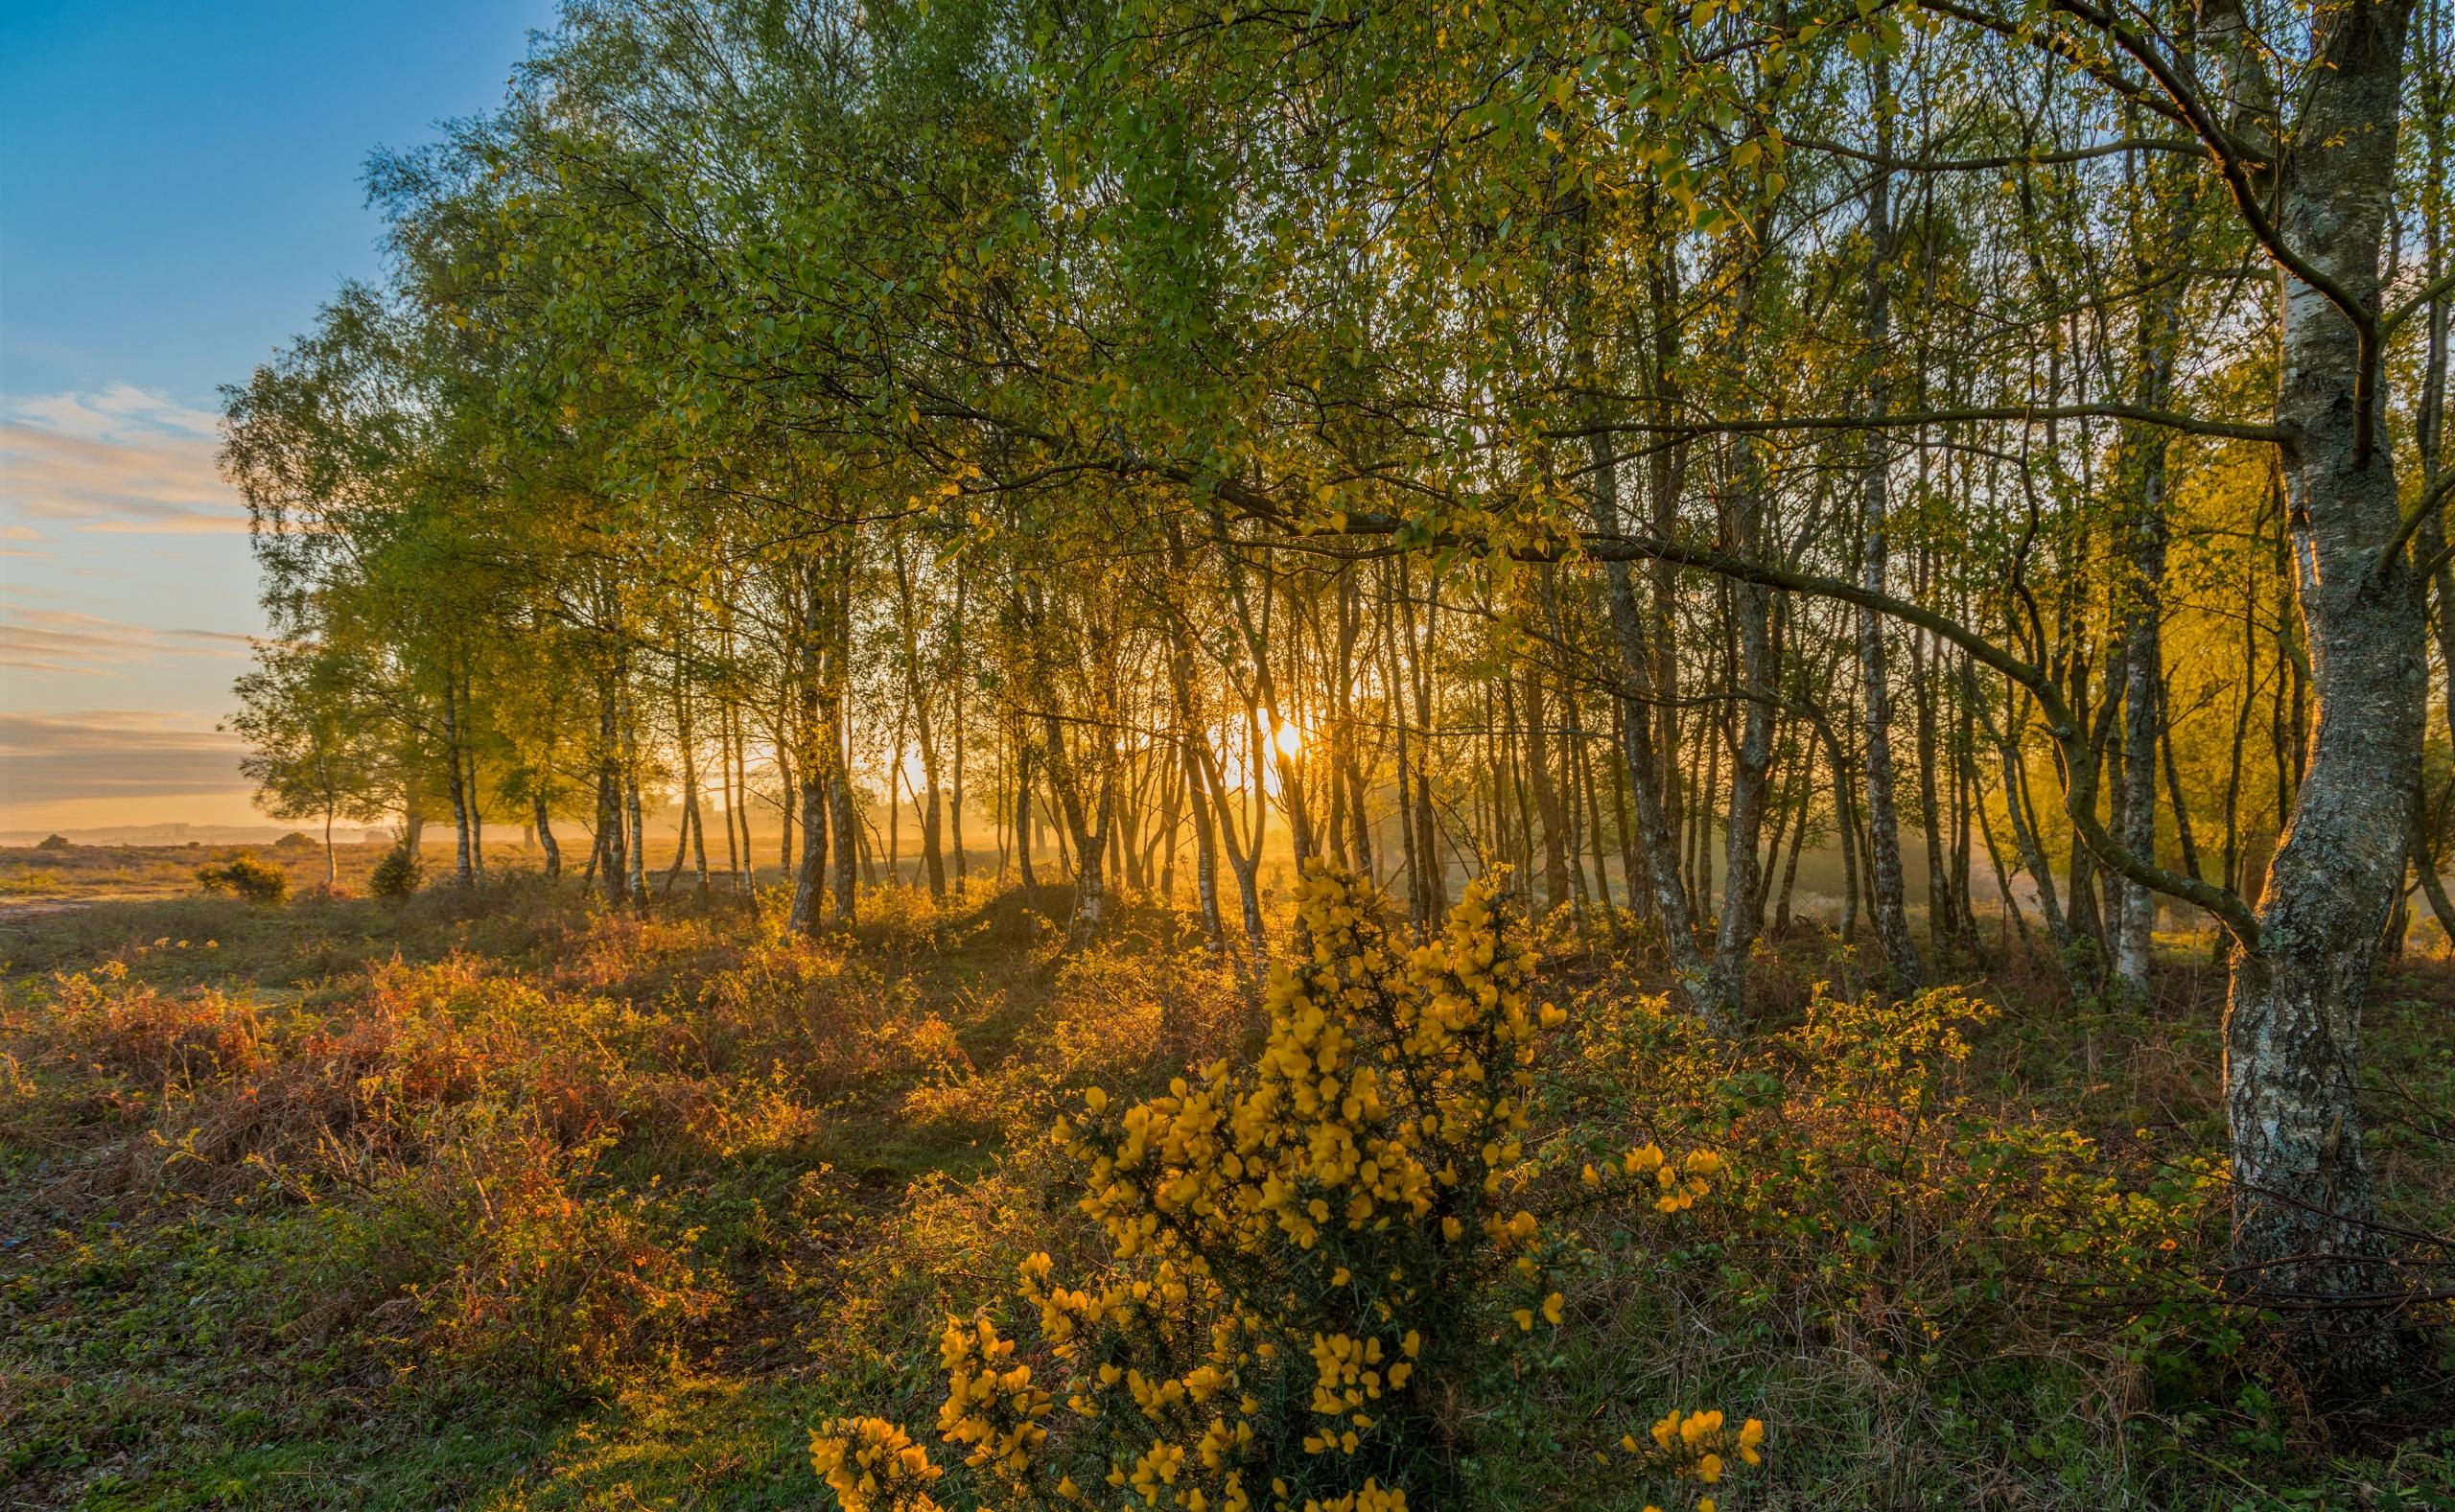 Картинки Англия Rockford New Forest National Park Природа осенние парк дерева 2560x1577 Осень Парки дерево Деревья деревьев